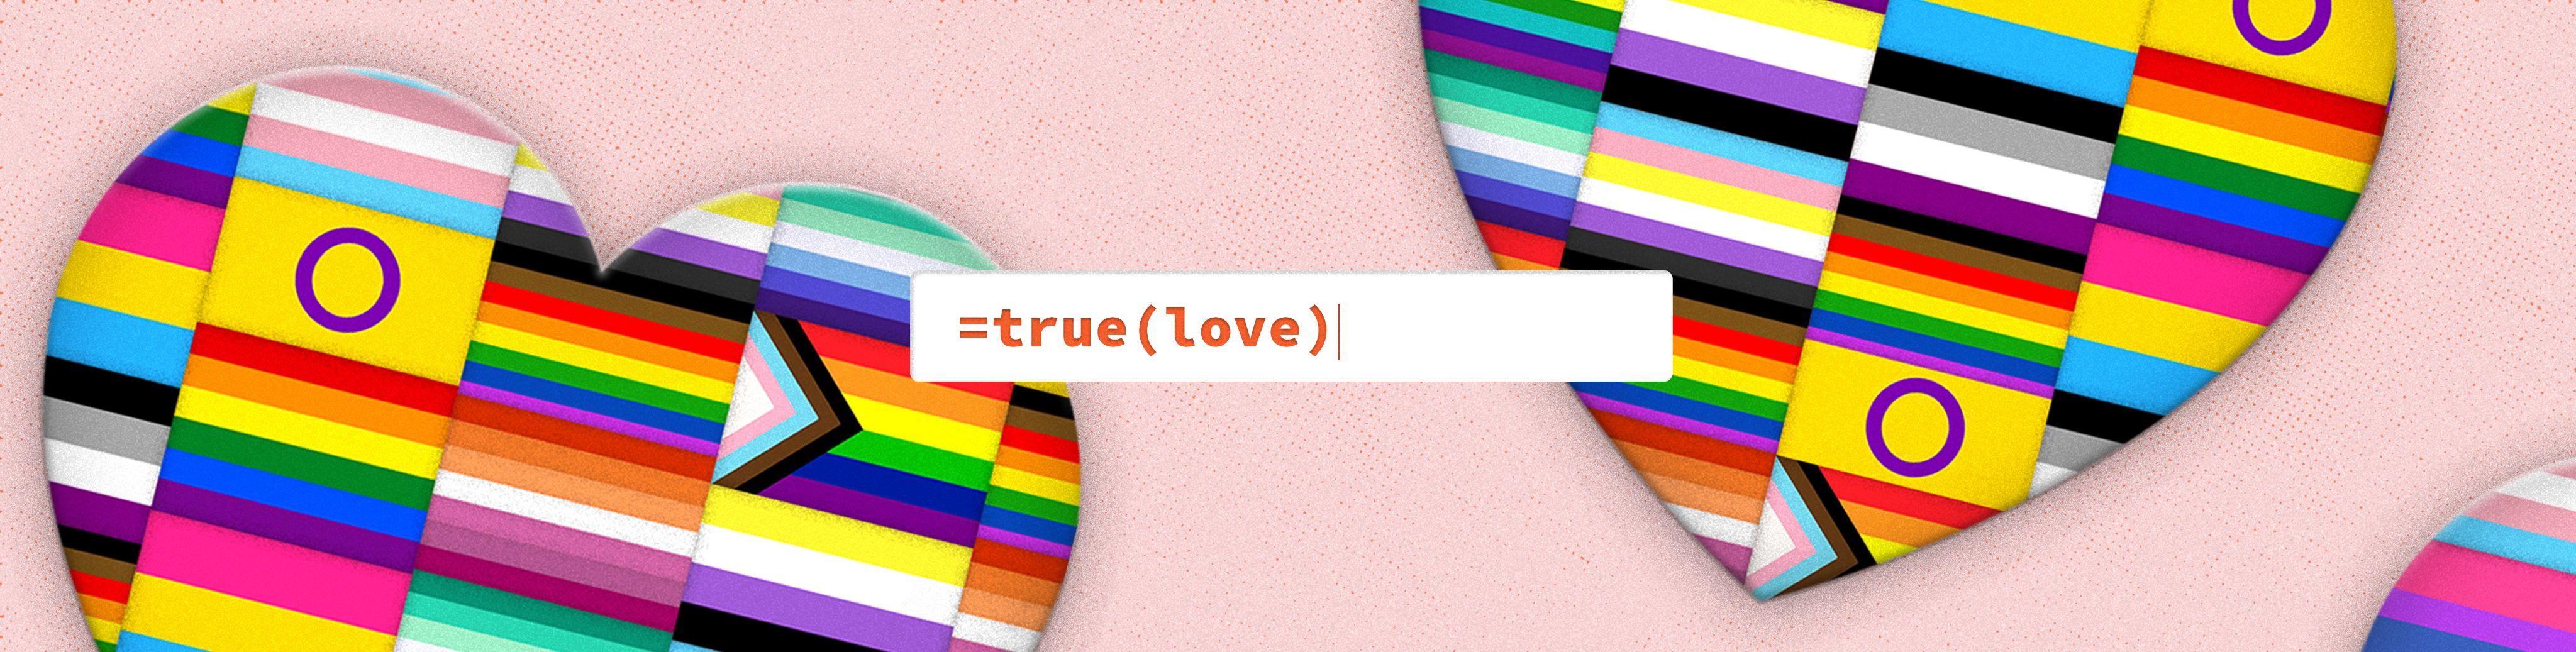 CPN-21004-Pride-1500x380@2x-True(Love).png